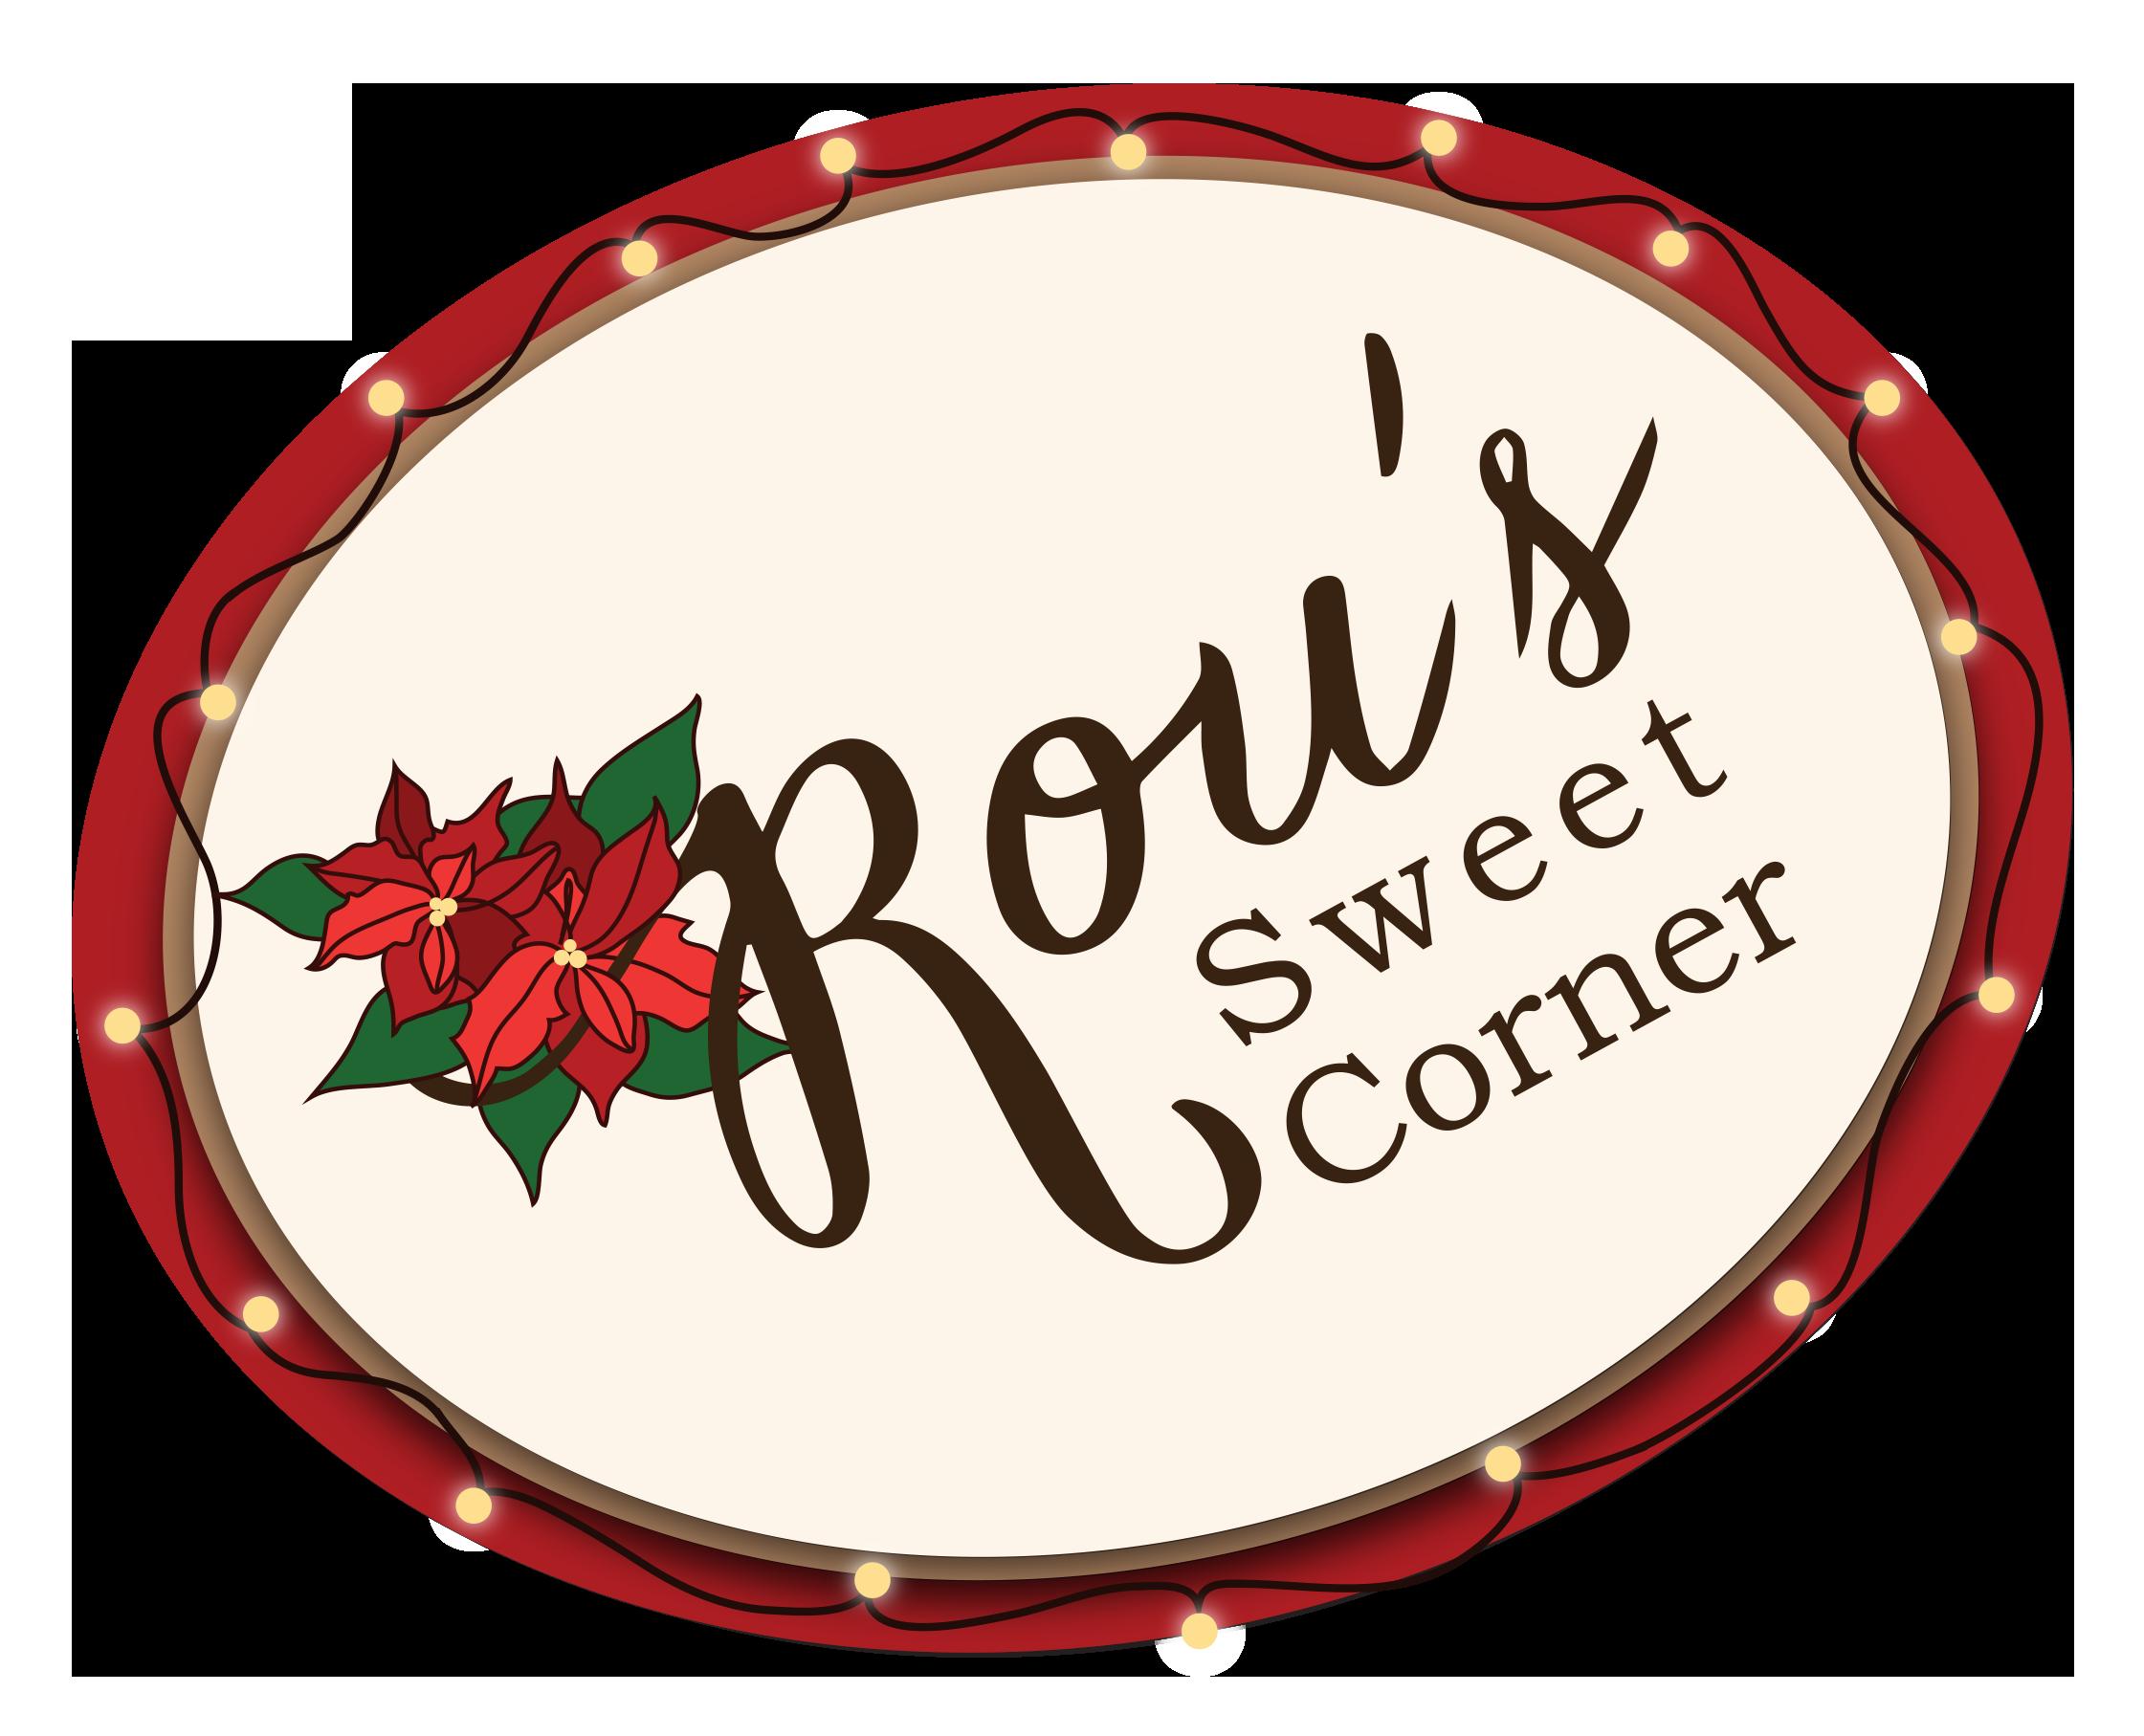 Rou's Sweet Corner